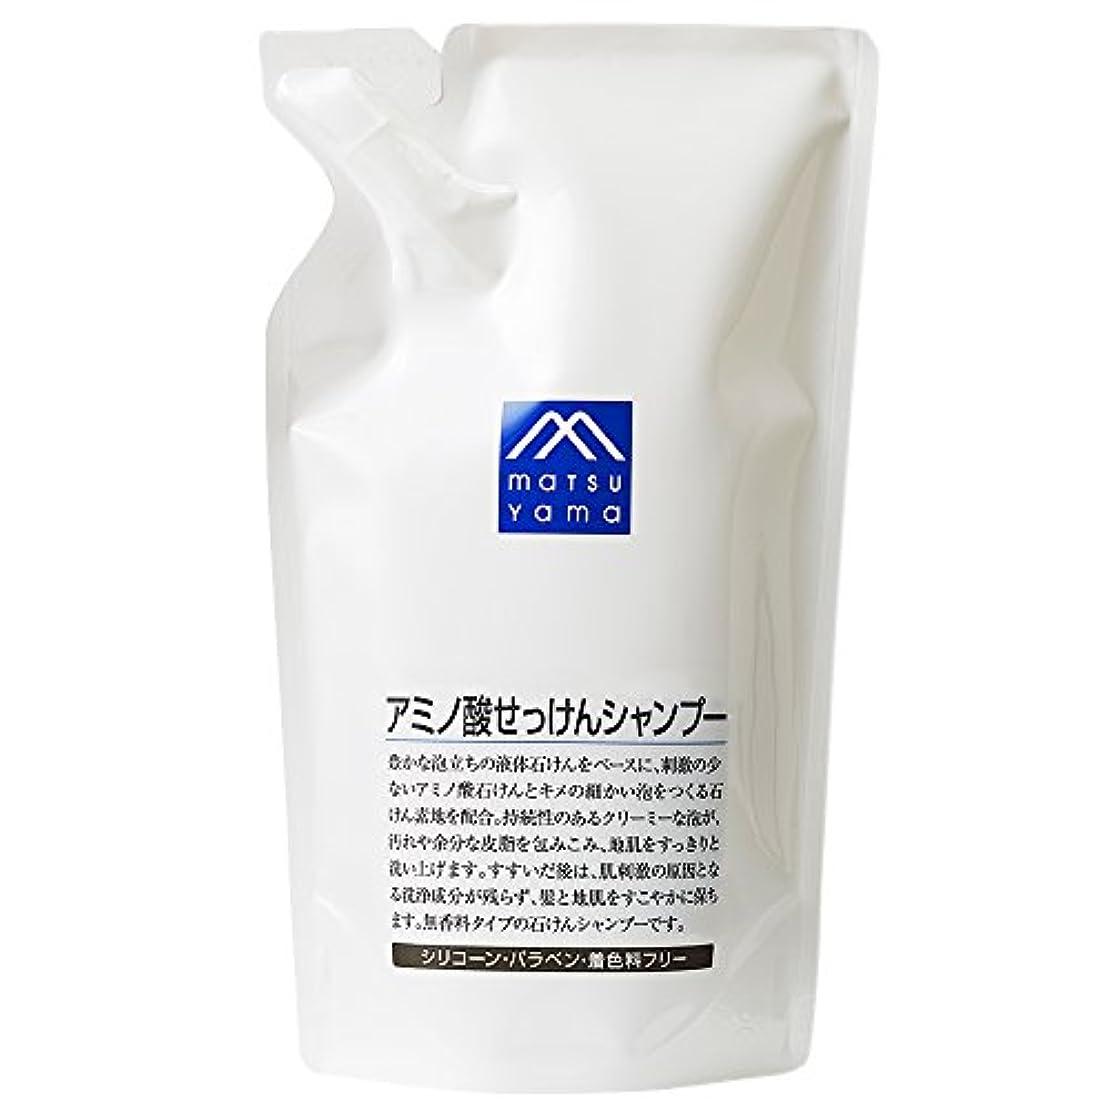 M-mark アミノ酸せっけんシャンプー 詰替用